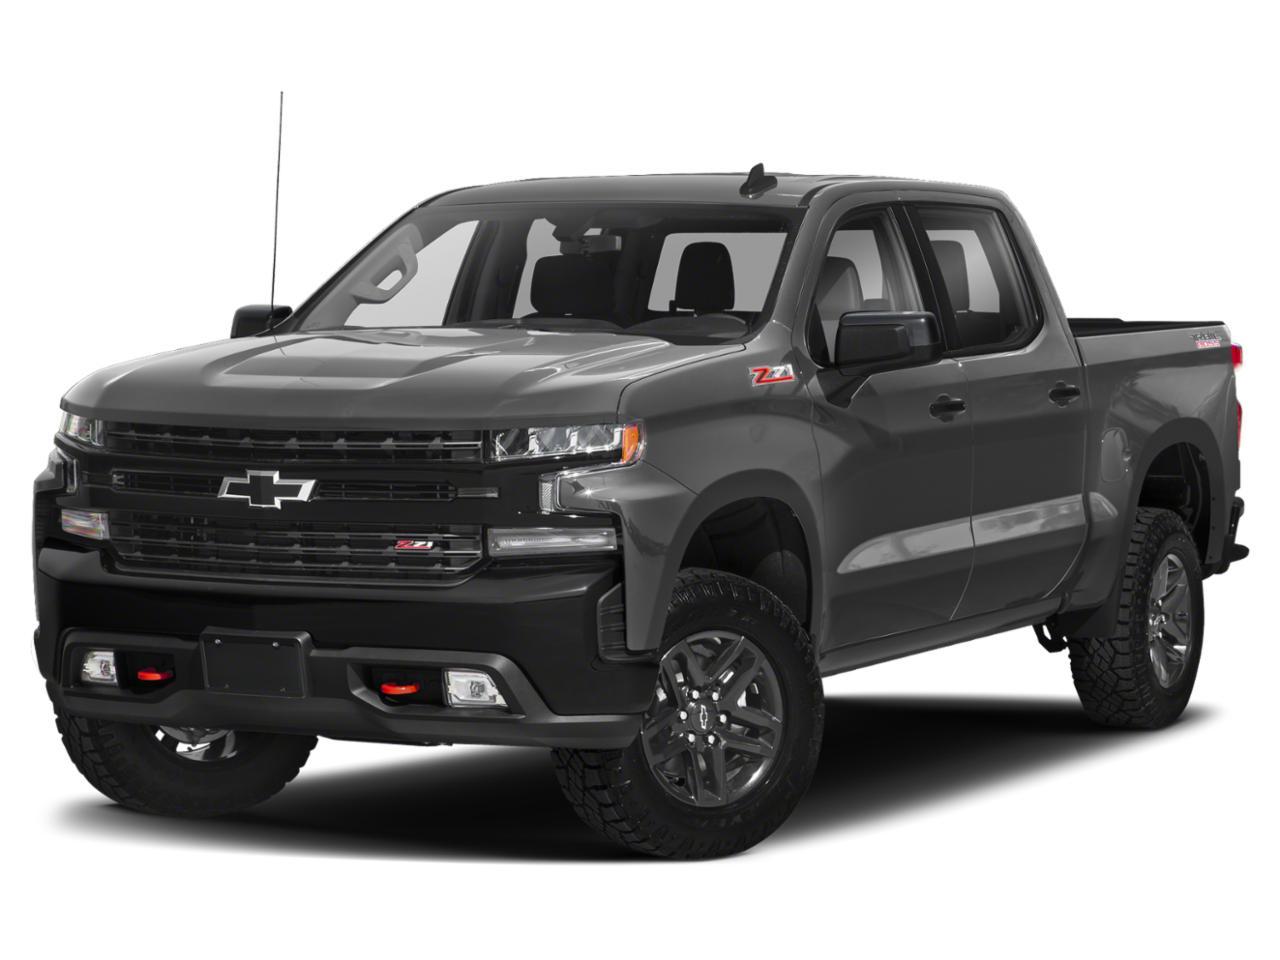 satin steel metallic 2019 Chevrolet Silverado 1500 RST Crew Cab Pickup Lexington NC